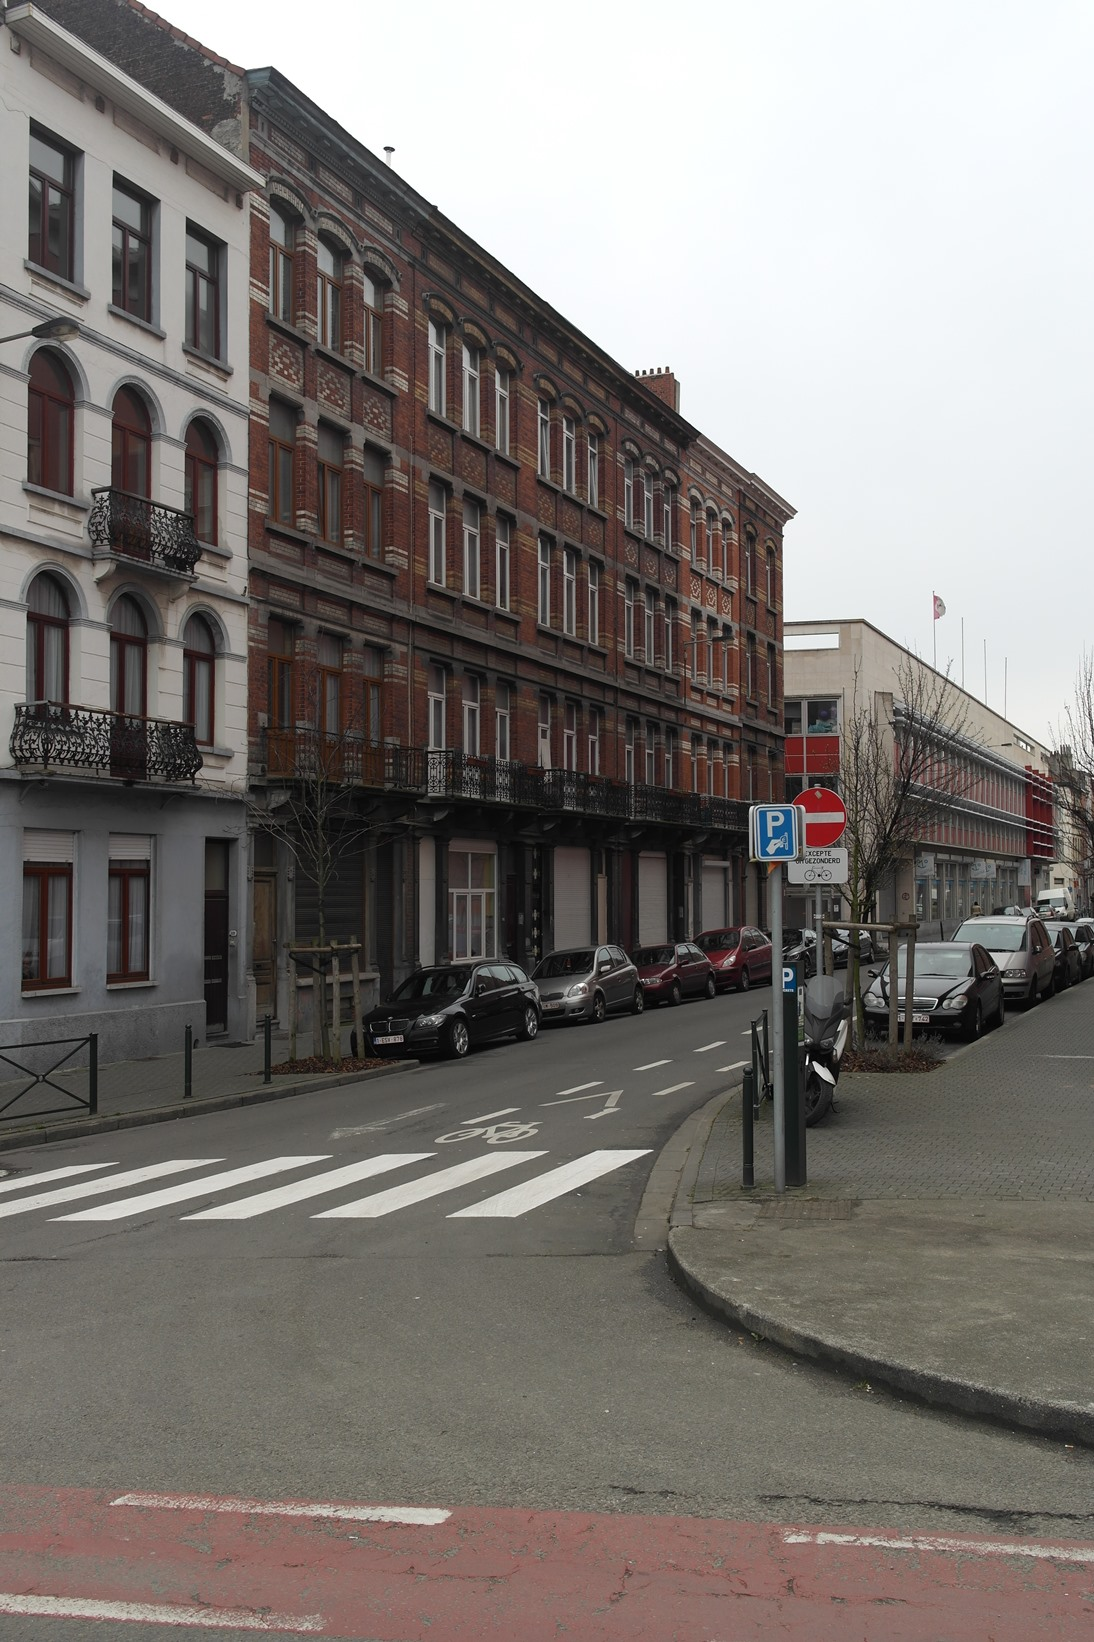 Rue Vandenboogaerde 99, 101, 103, 105, 107 et rue Le Lorrain 113, 115, 2015